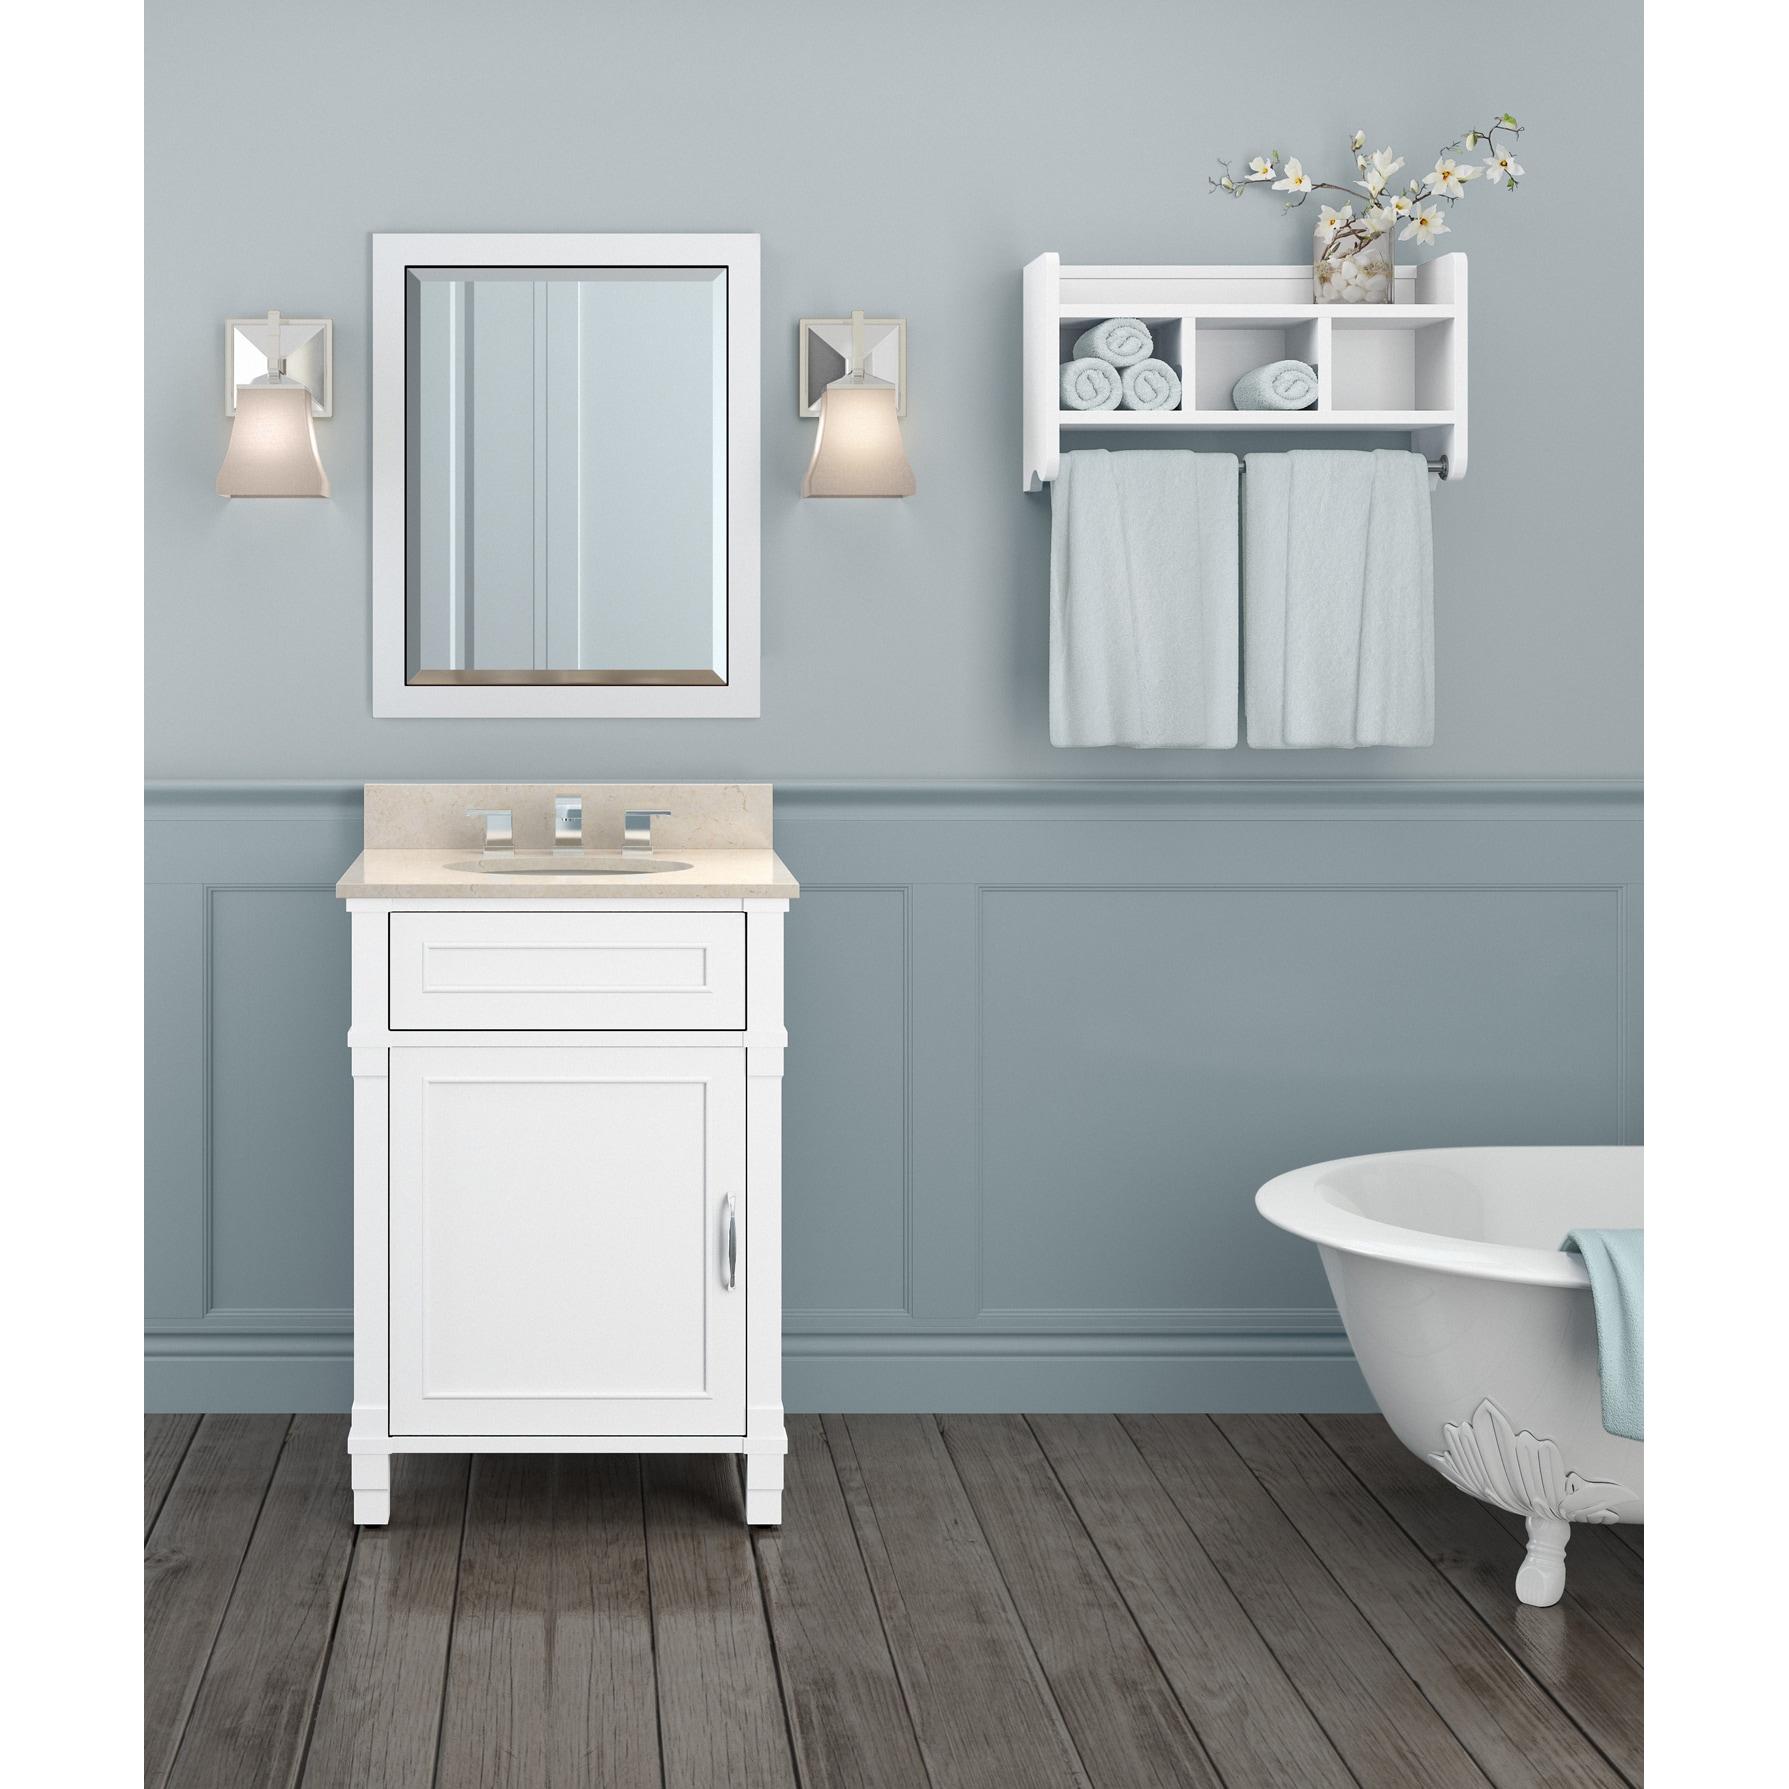 Shop Williamsburg Marble Sink White 24-in Bathroom Vanity with ...